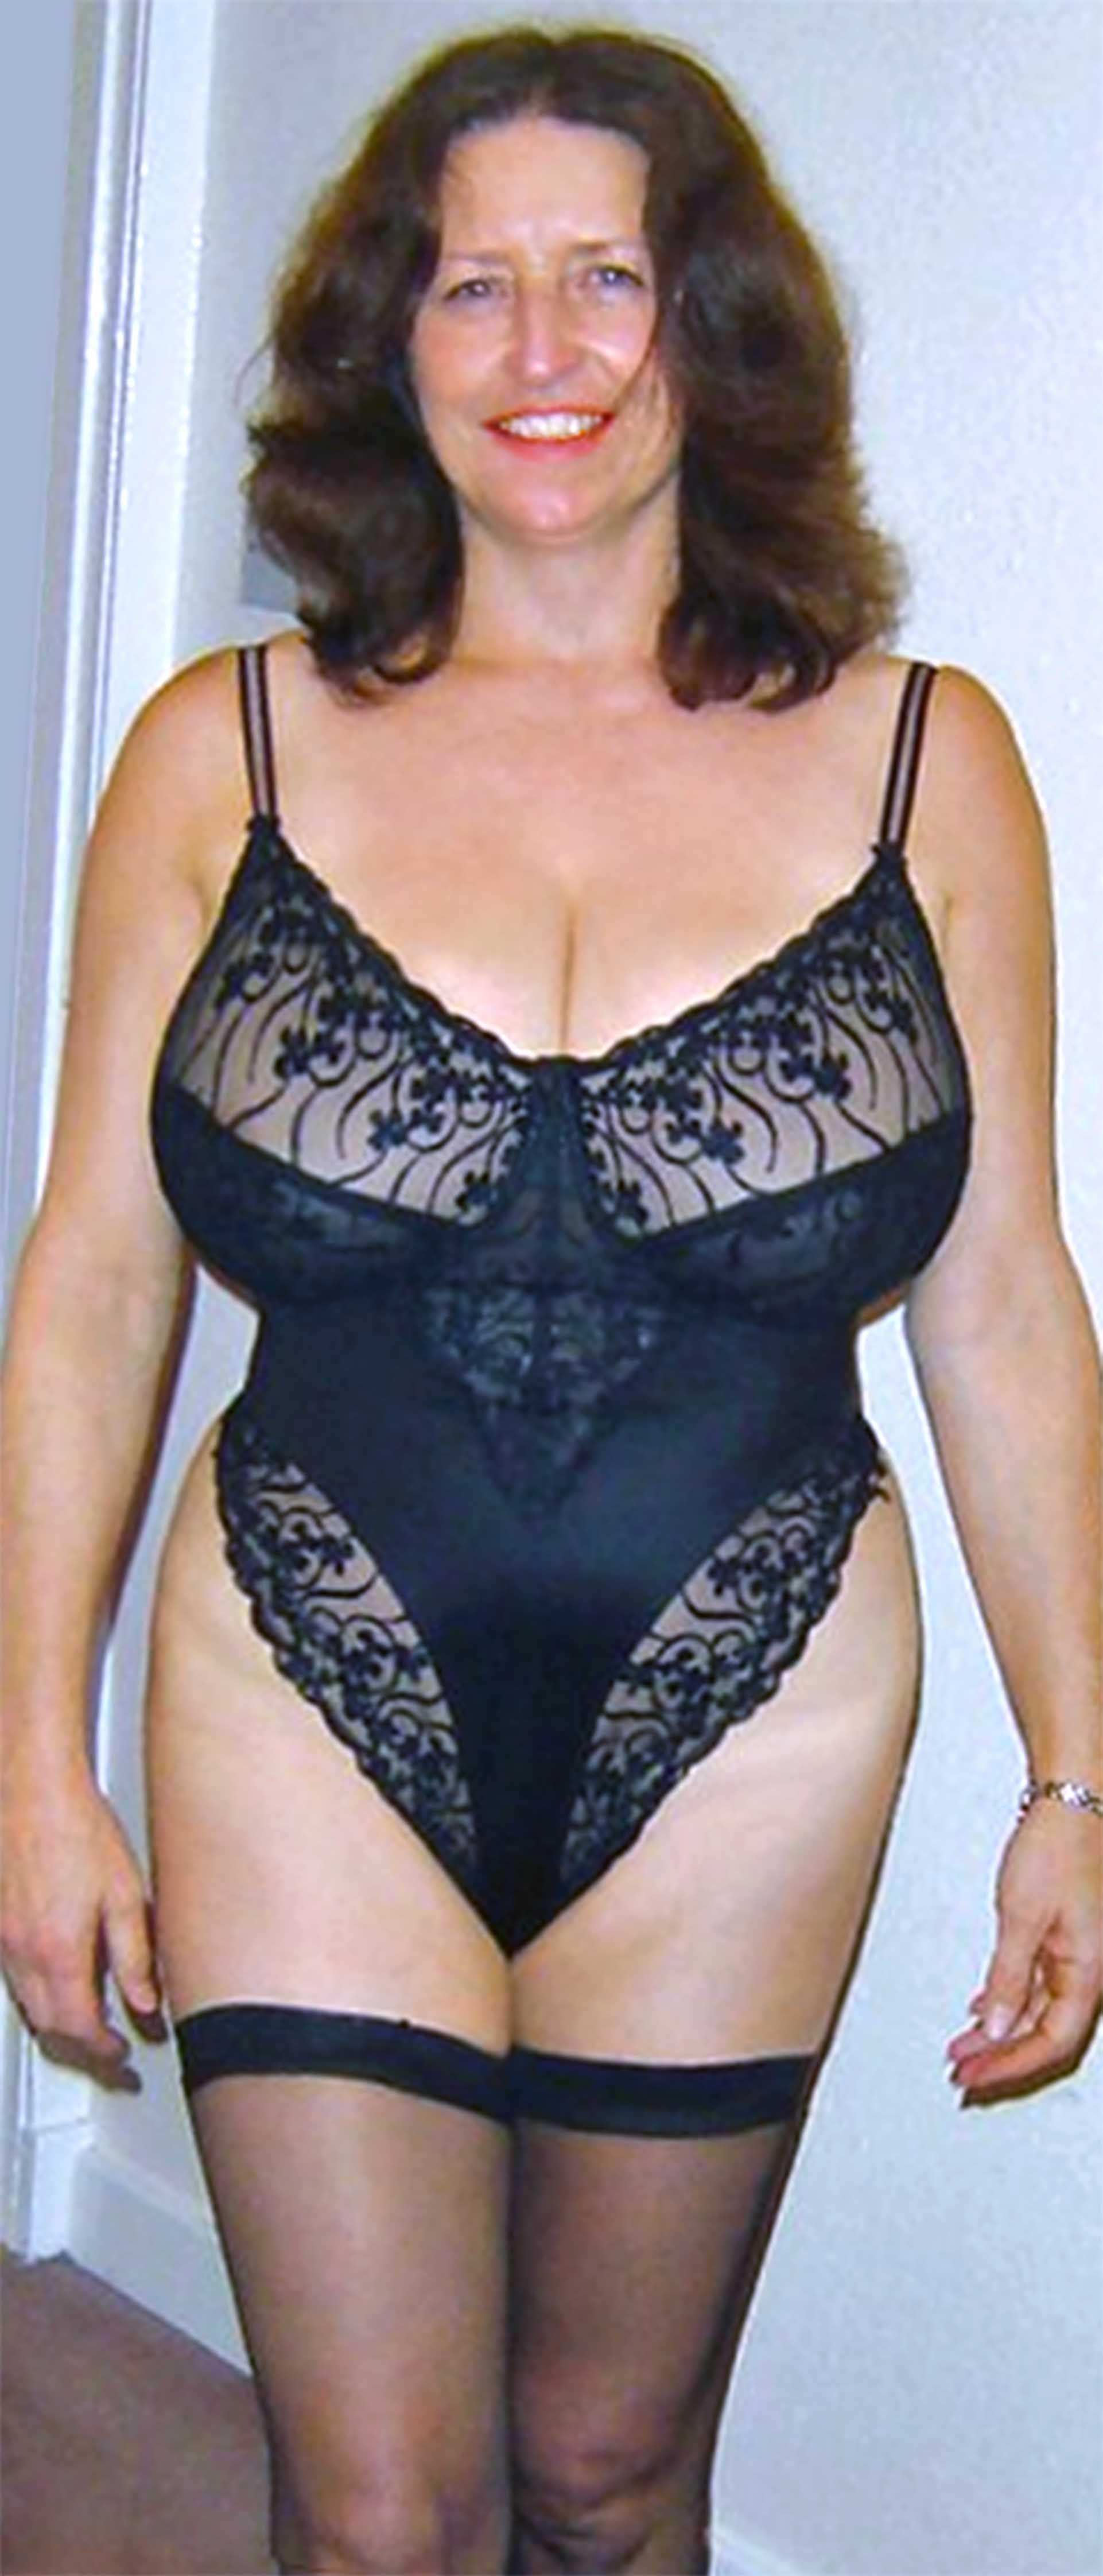 Mature see through lace panties